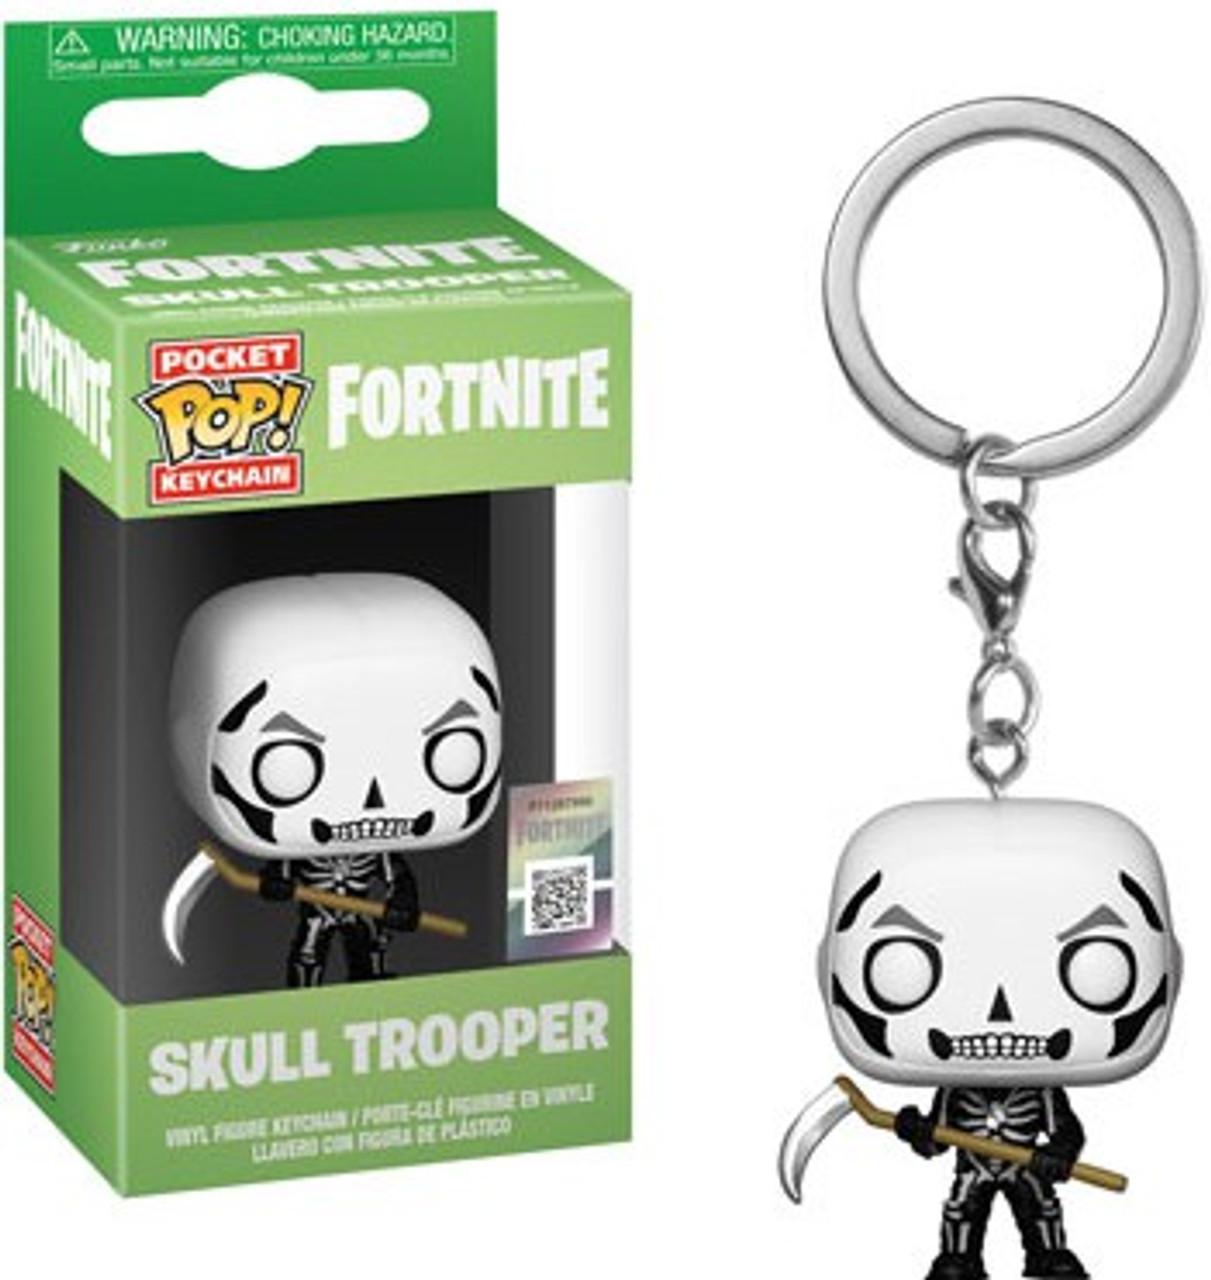 fc5f905e827 Funko Fortnite Pocket POP Games Skull Trooper Keychain - ToyWiz